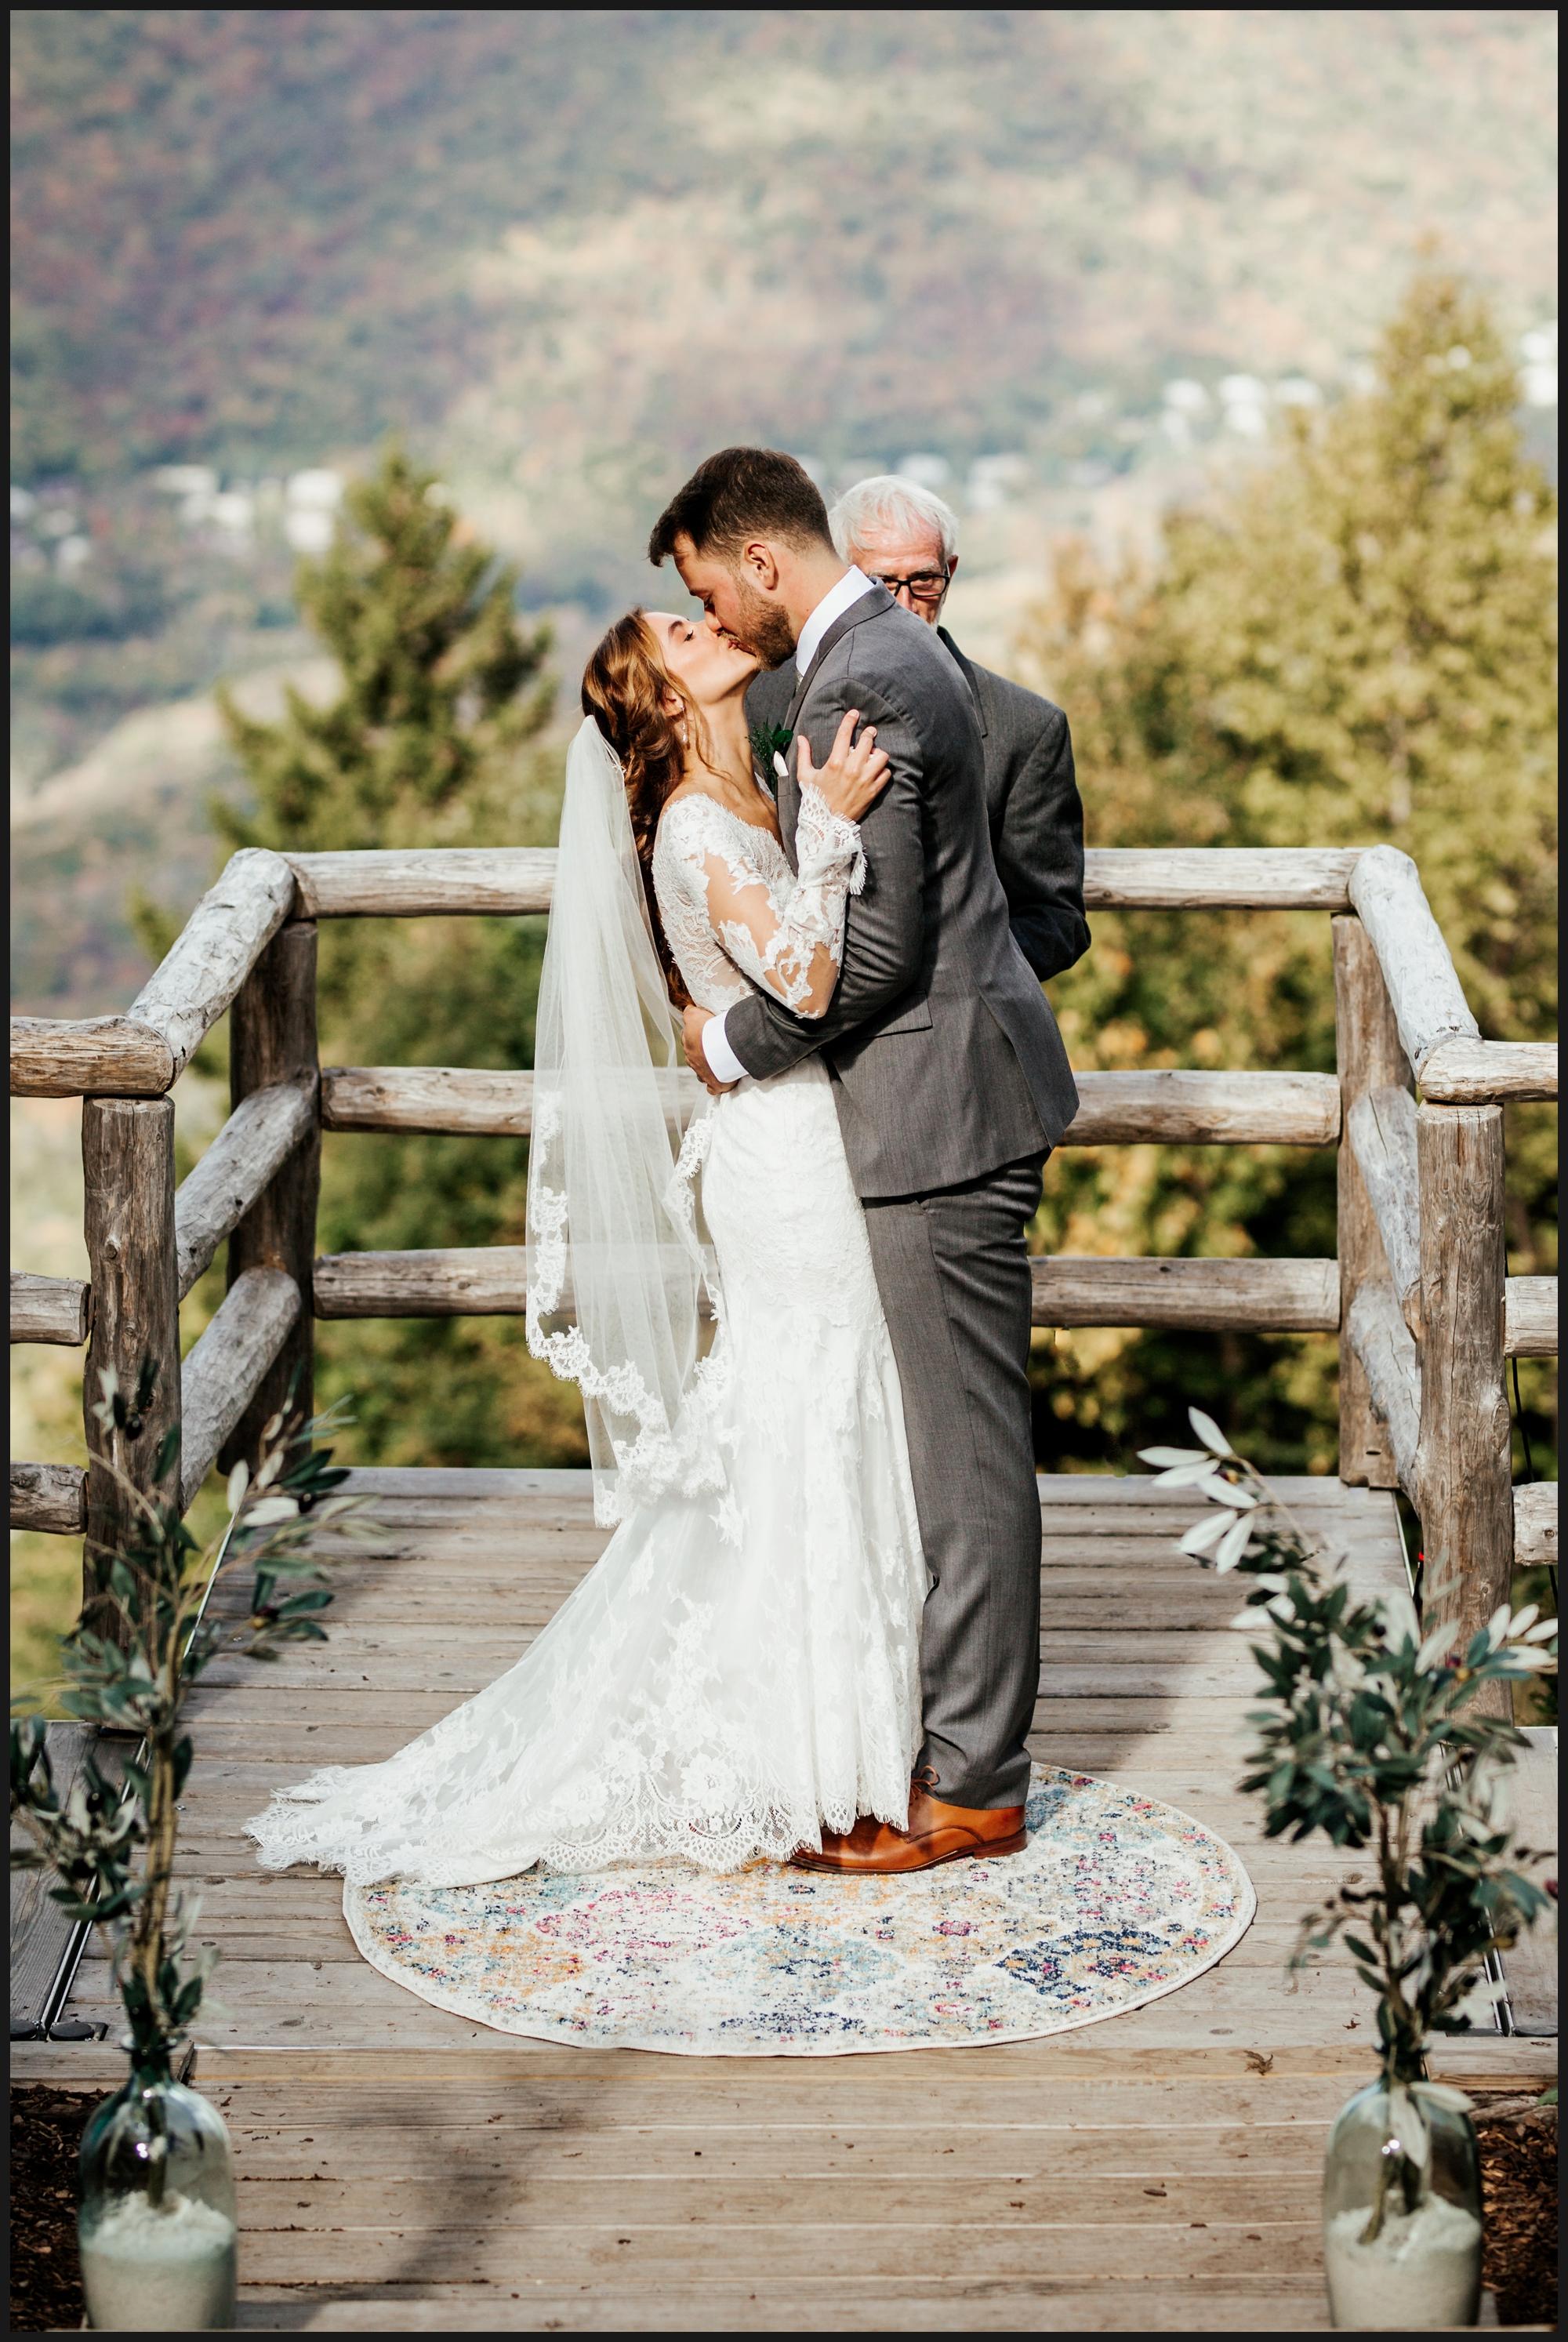 Orlando-Wedding-Photographer-destination-wedding-photographer-florida-wedding-photographer-hawaii-wedding-photographer_0141.jpg